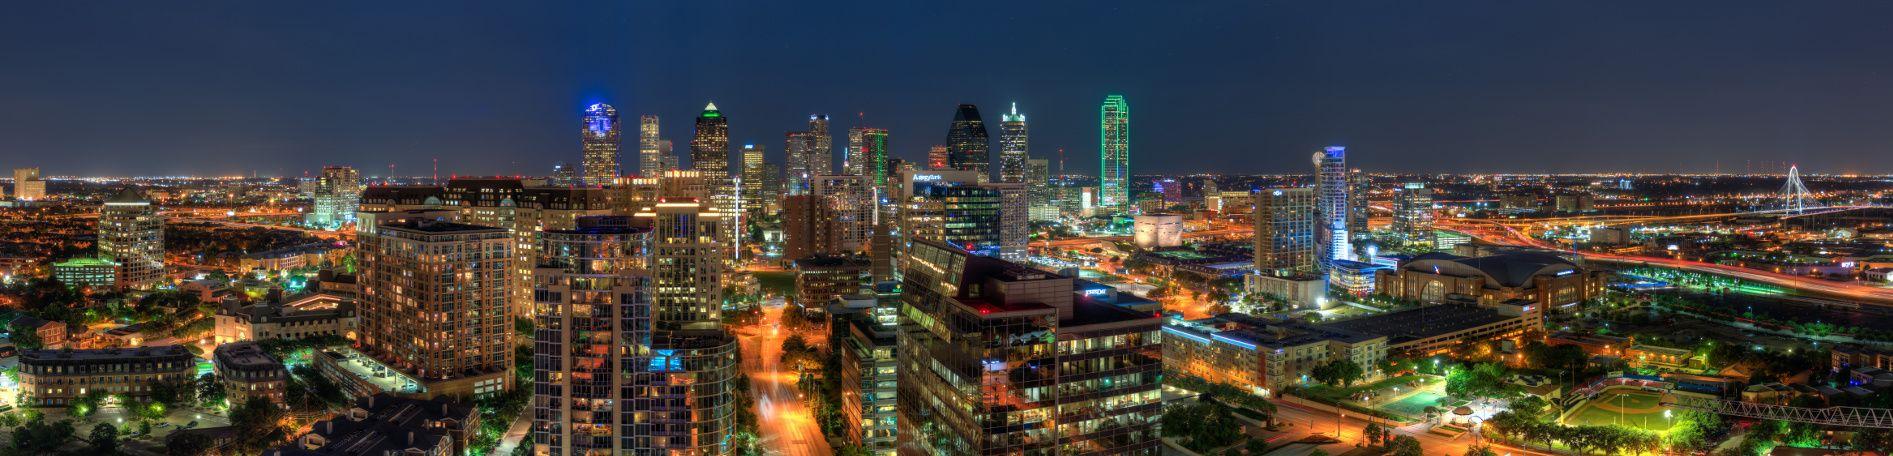 Apartments Dallas Tx